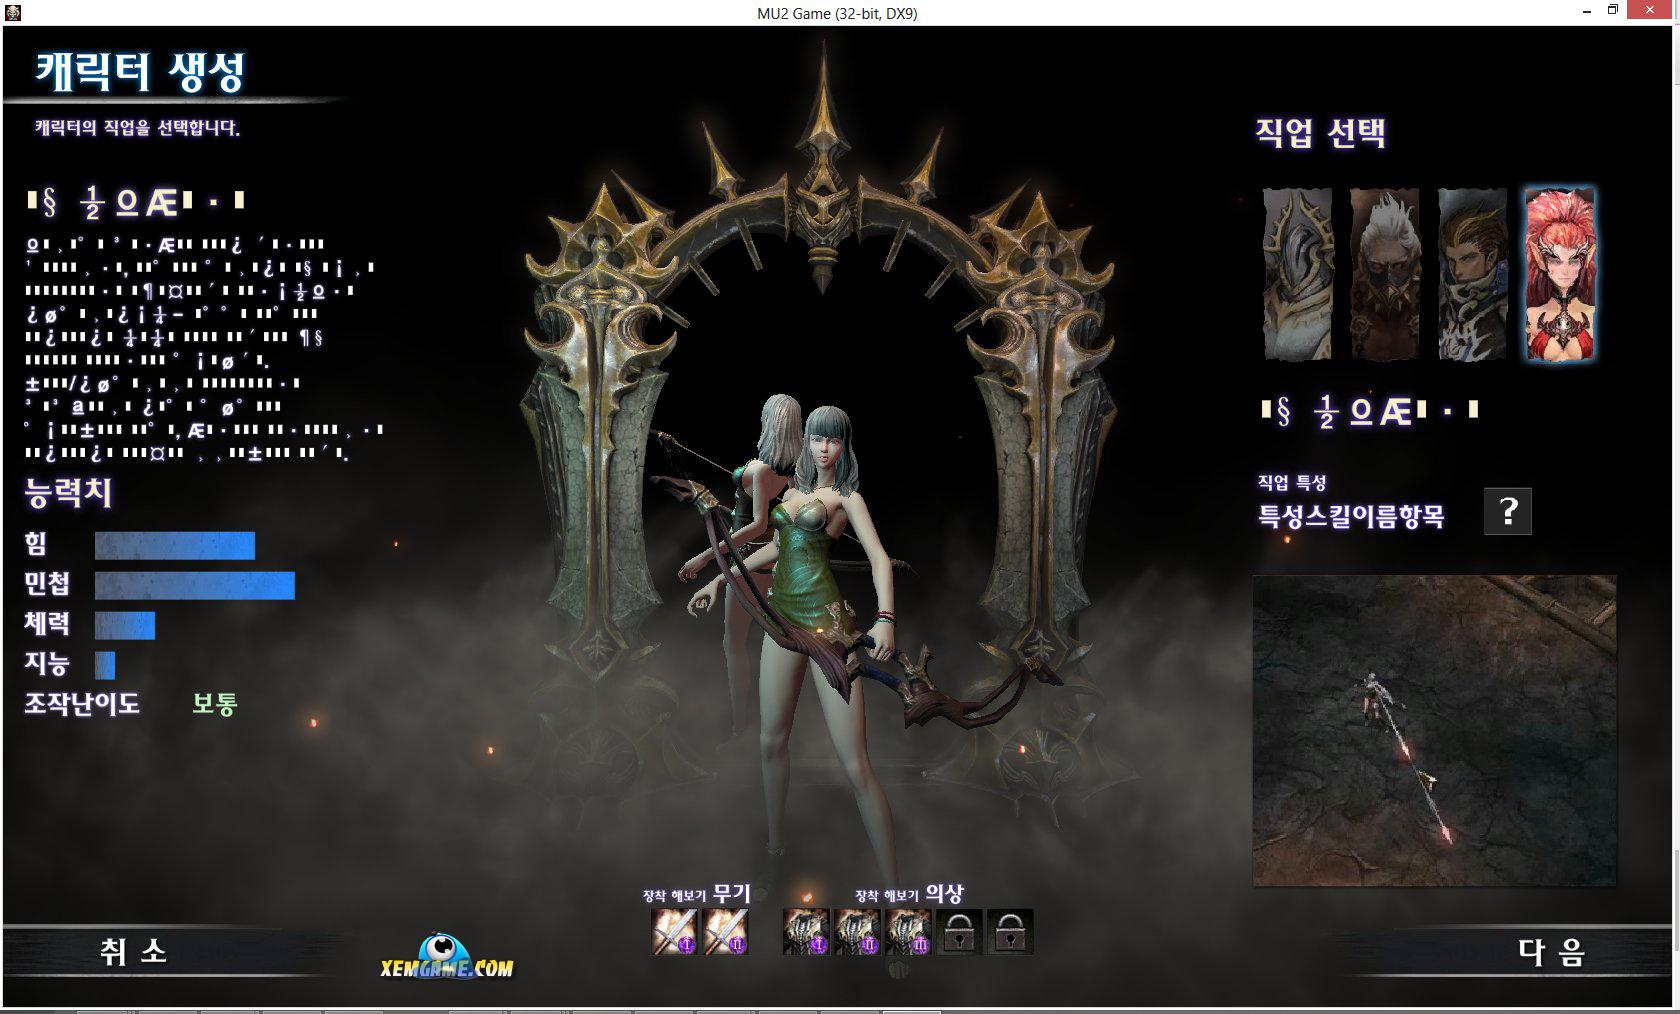 MU2 Hàn Quốc   XEMGAME.COM